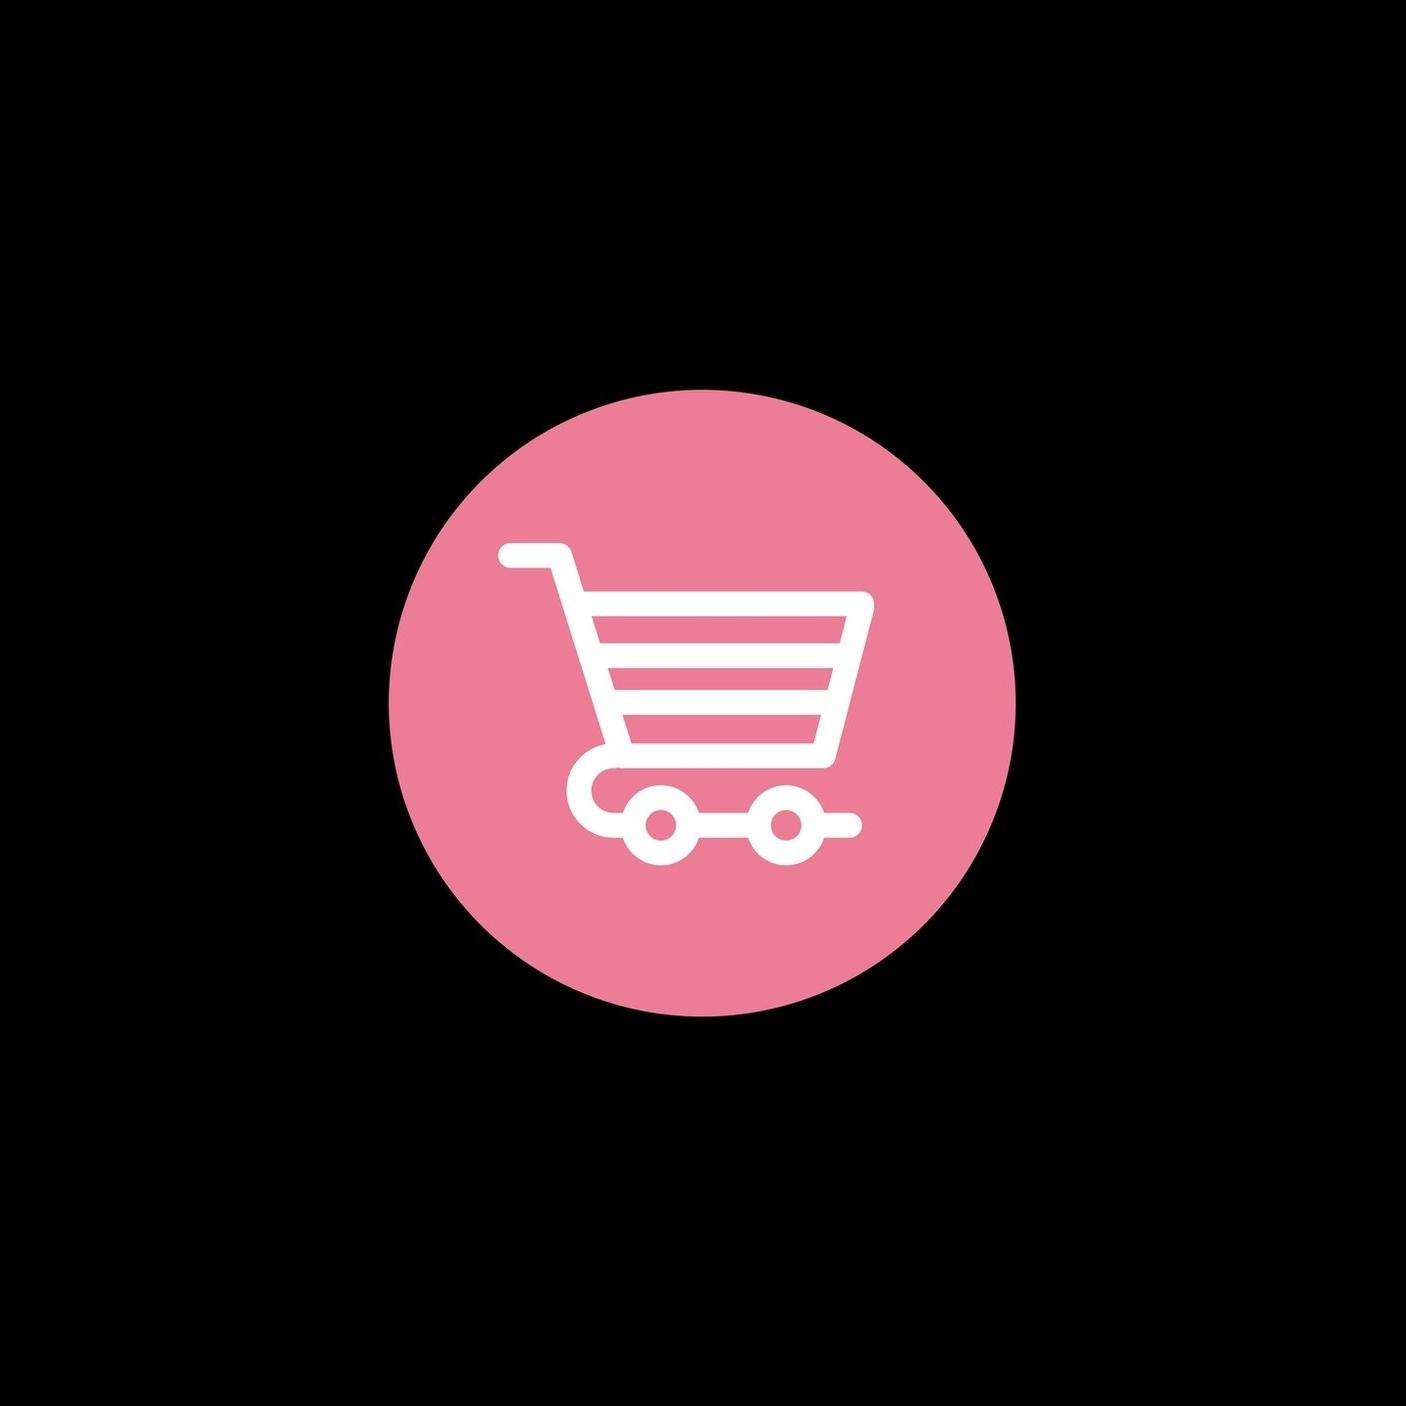 Blue Pink Circles Beauty Makeup Youtube Channel Art (5).jpg